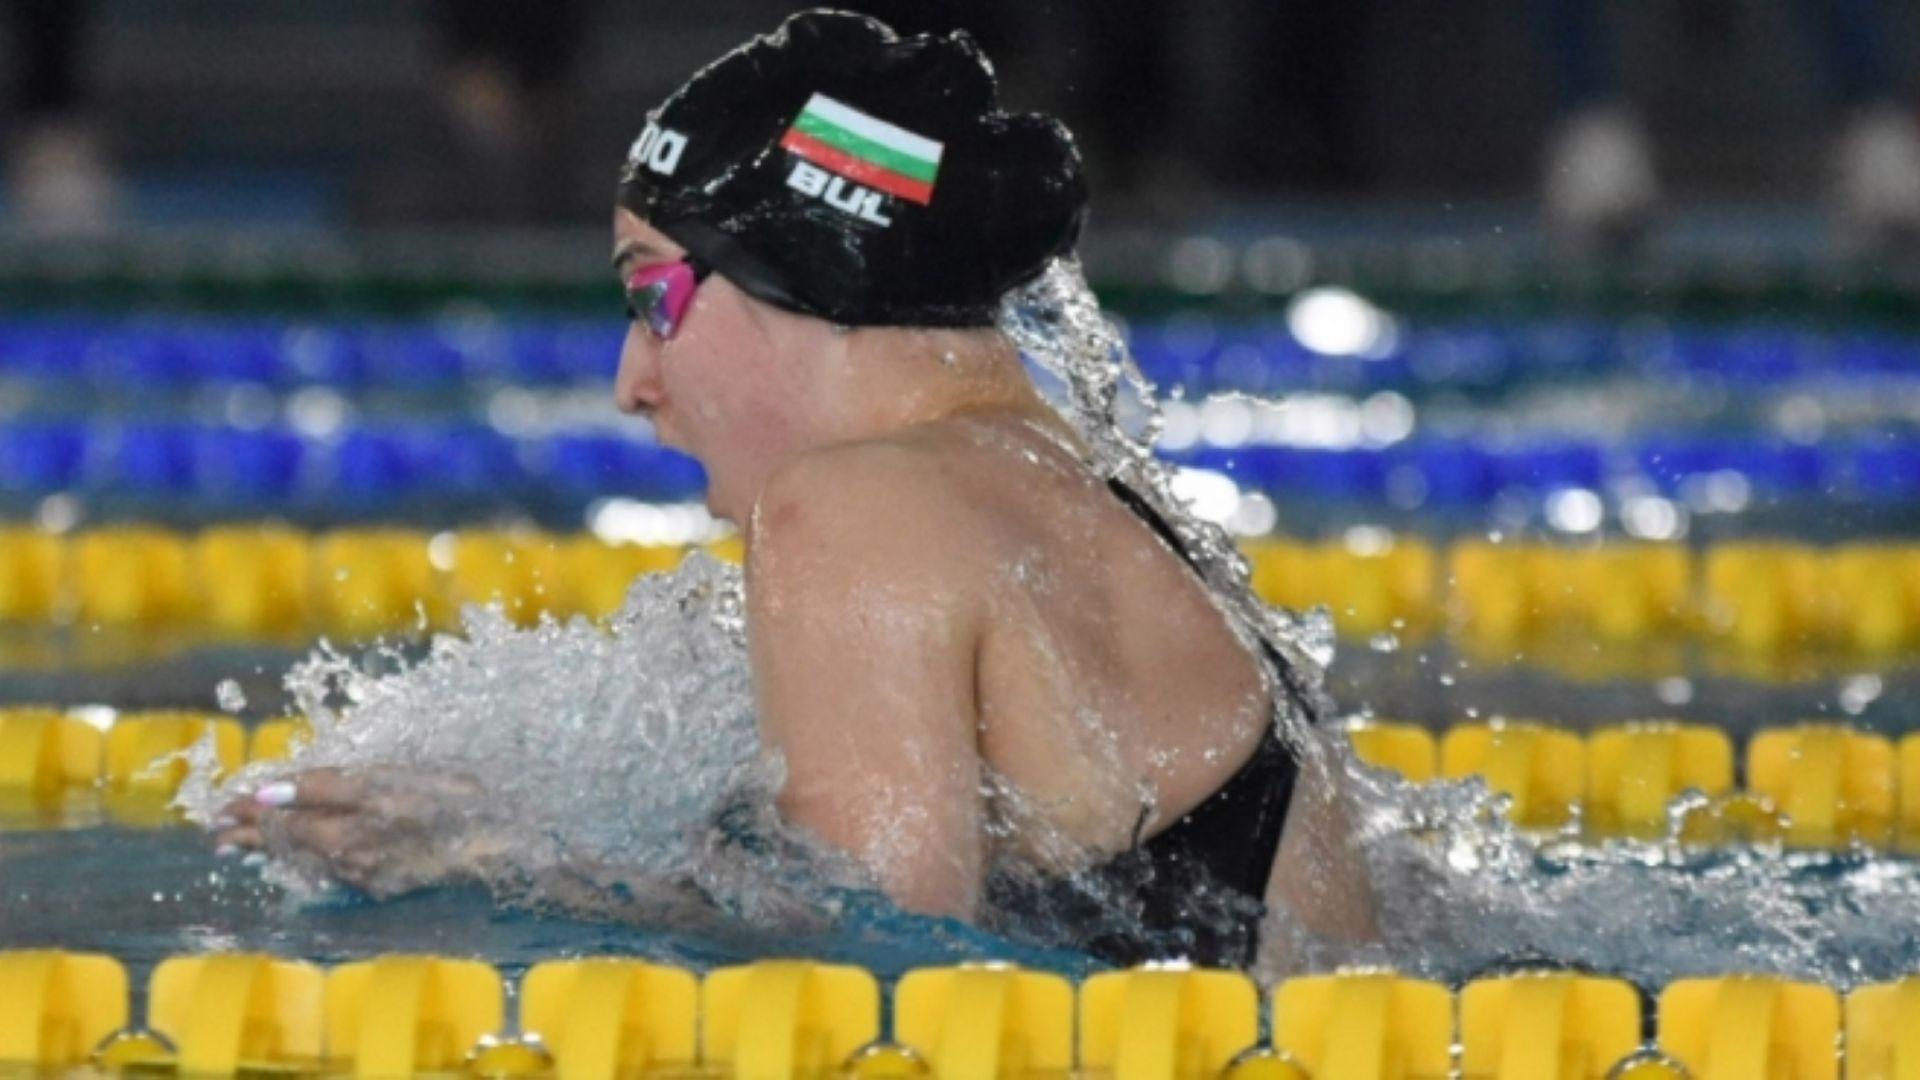 Падна 31-годишен рекорд на легендарната Таня Богомилова